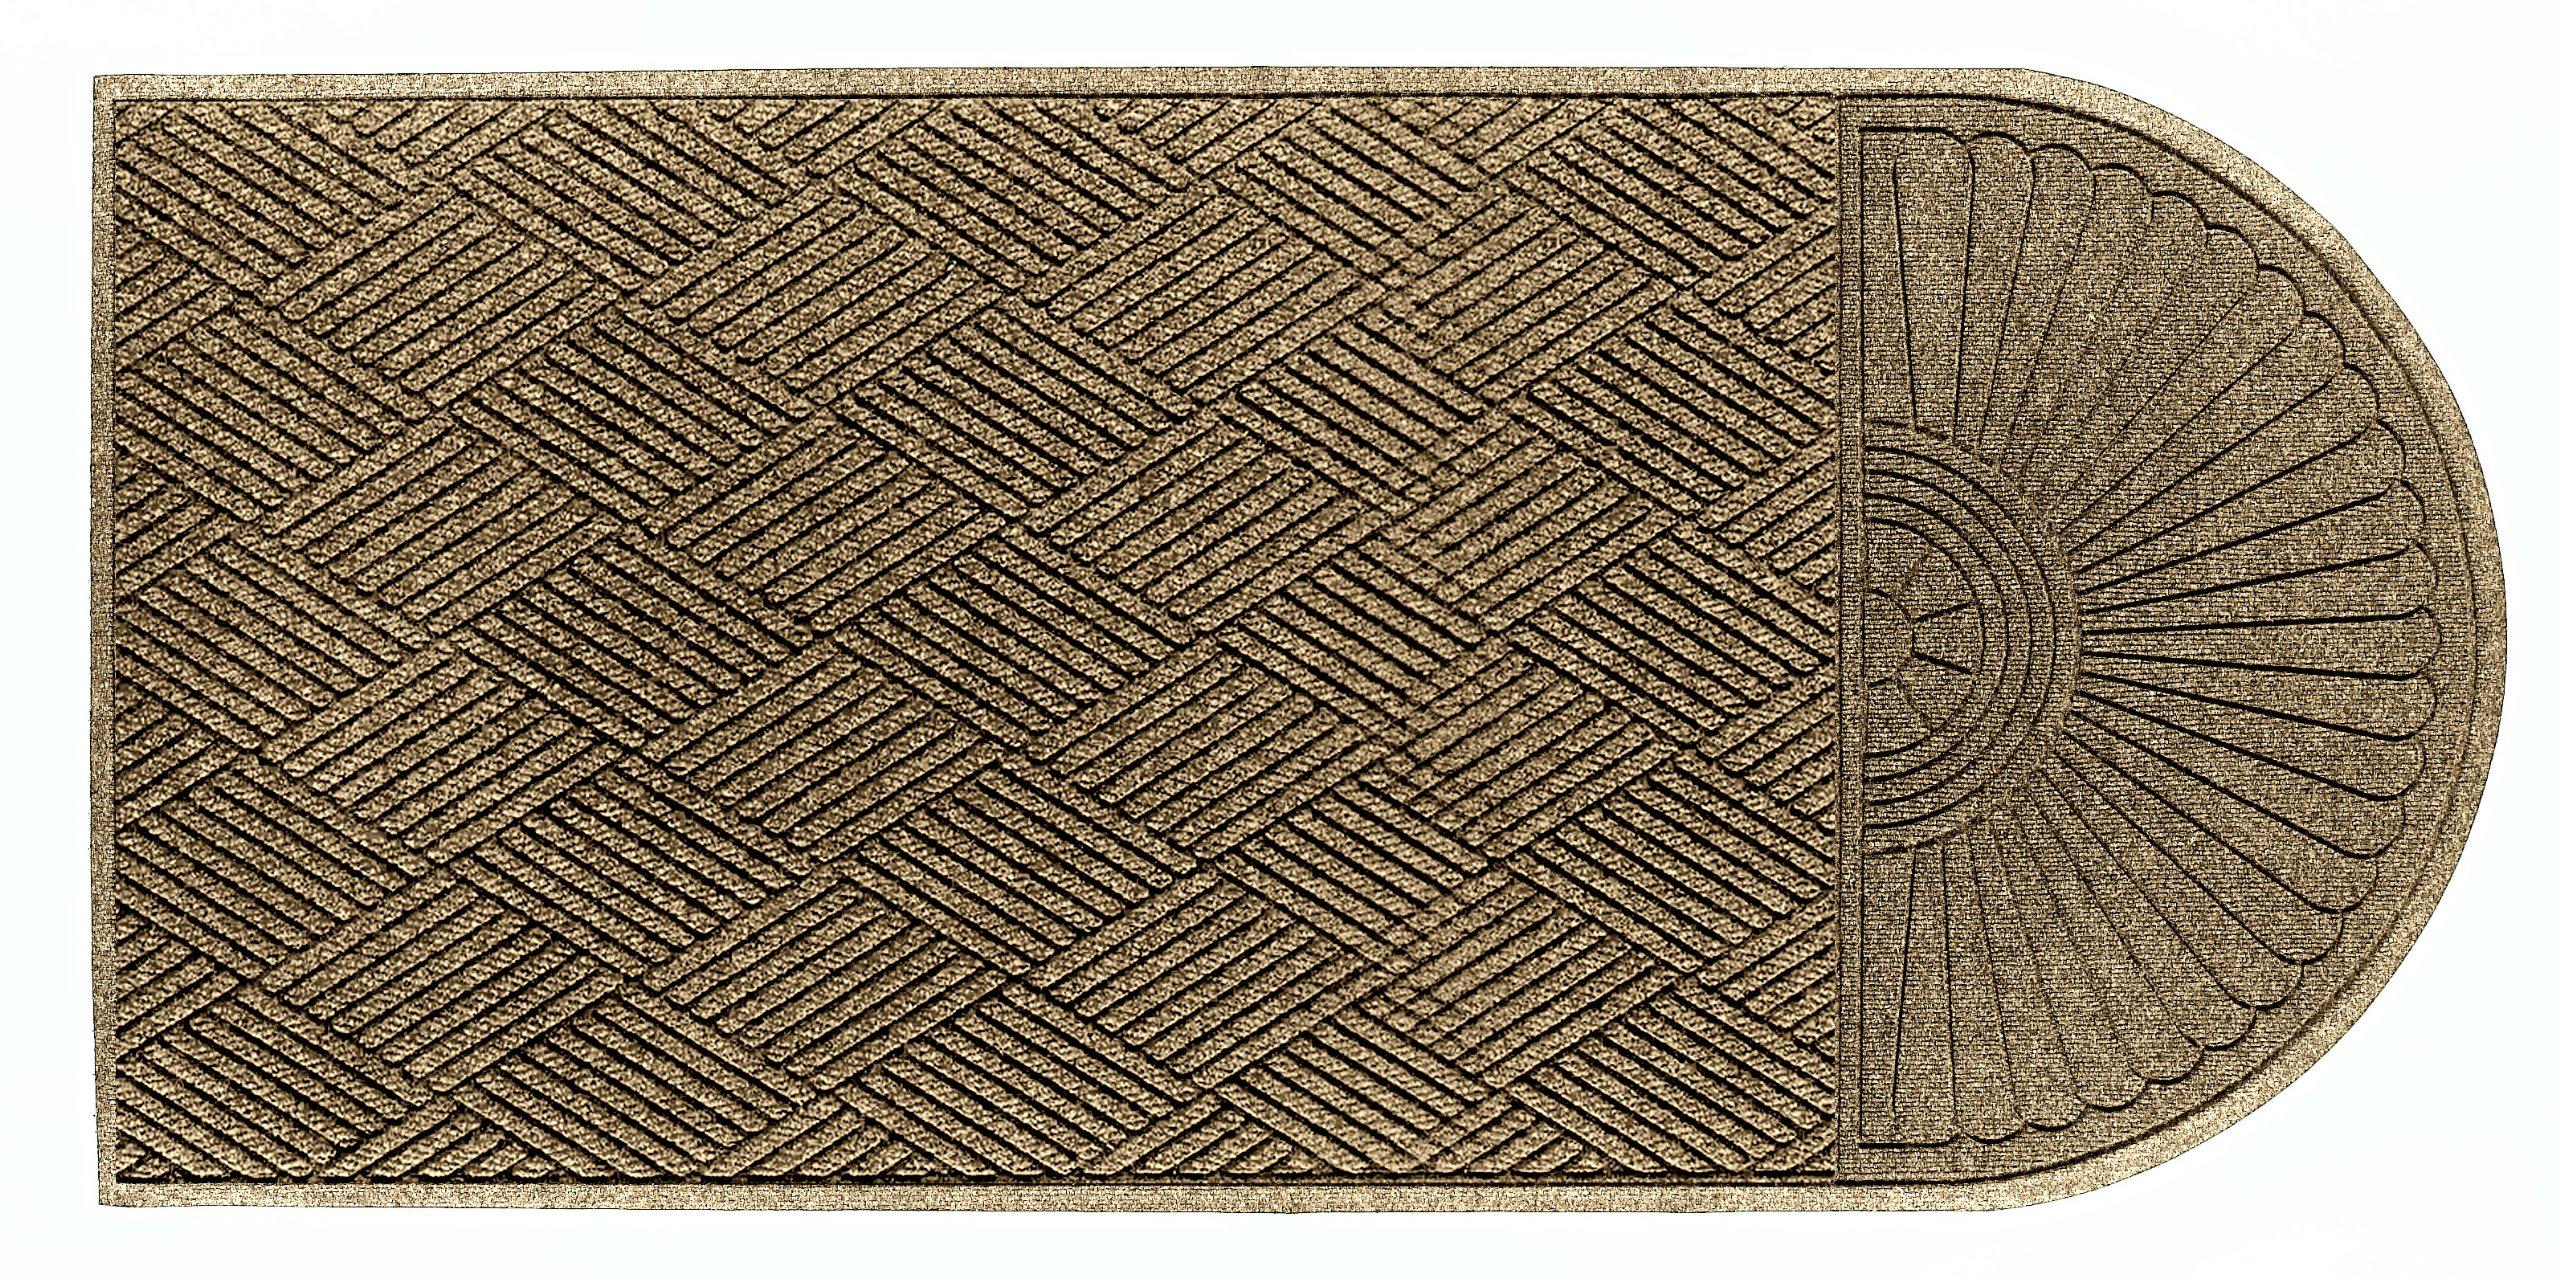 M+A Matting 22248 Waterhog Eco Grand Premier PET Polyester Fiber Single End Entrance Indoor/Outdoor Floor Mat, SBR Rubber Backing, 7' Length x 6' Width, 3/8'' Thick, Khaki